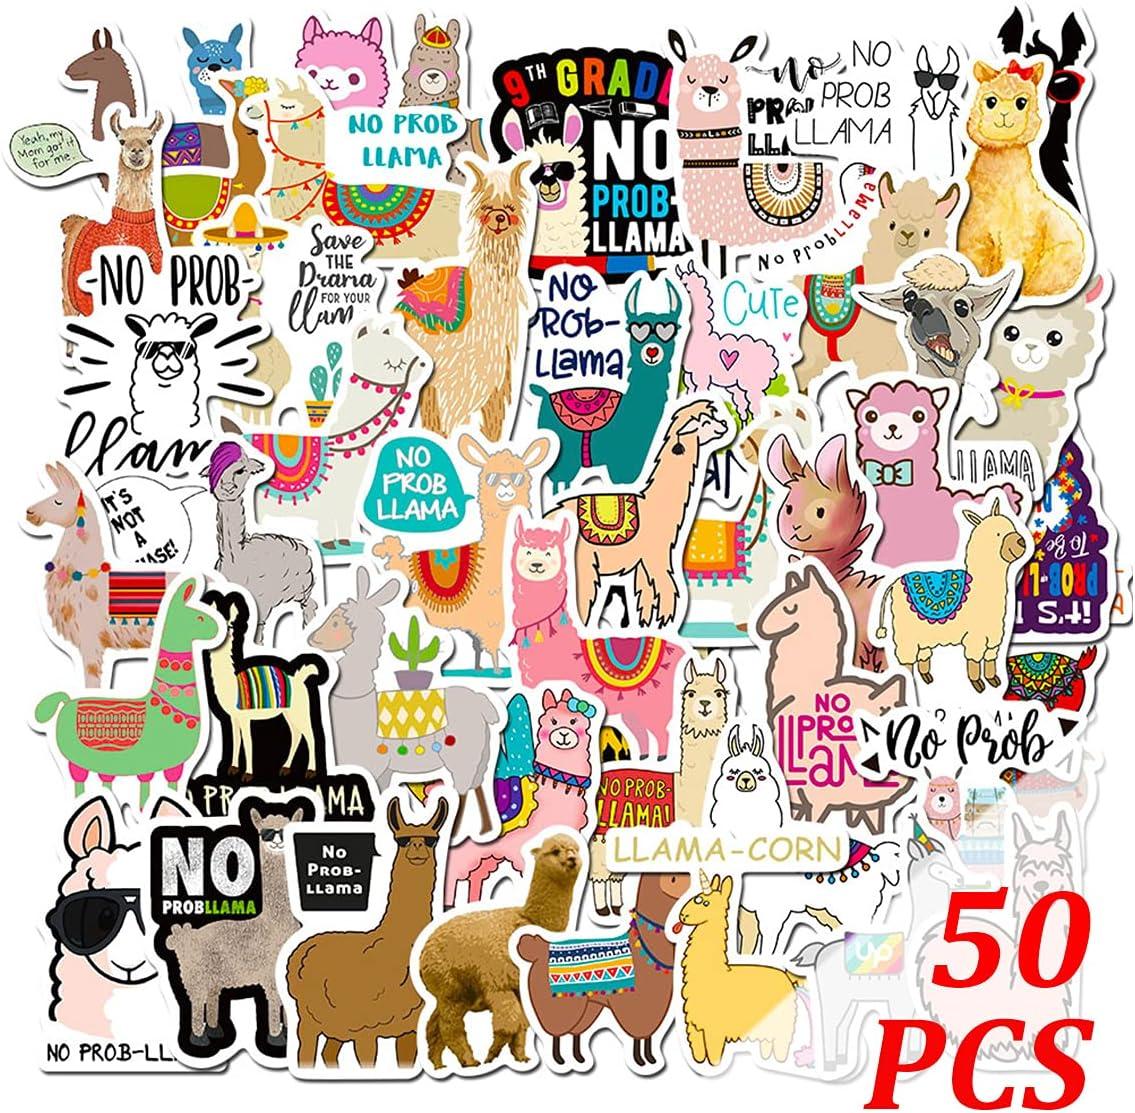 Alpaca Stickers 50pcs Llama Stickers Cartoon Stickers for Kids Computer Stickers Laptop Stickers Car Stickers Wall Stickers (Alpaca-50pcs)